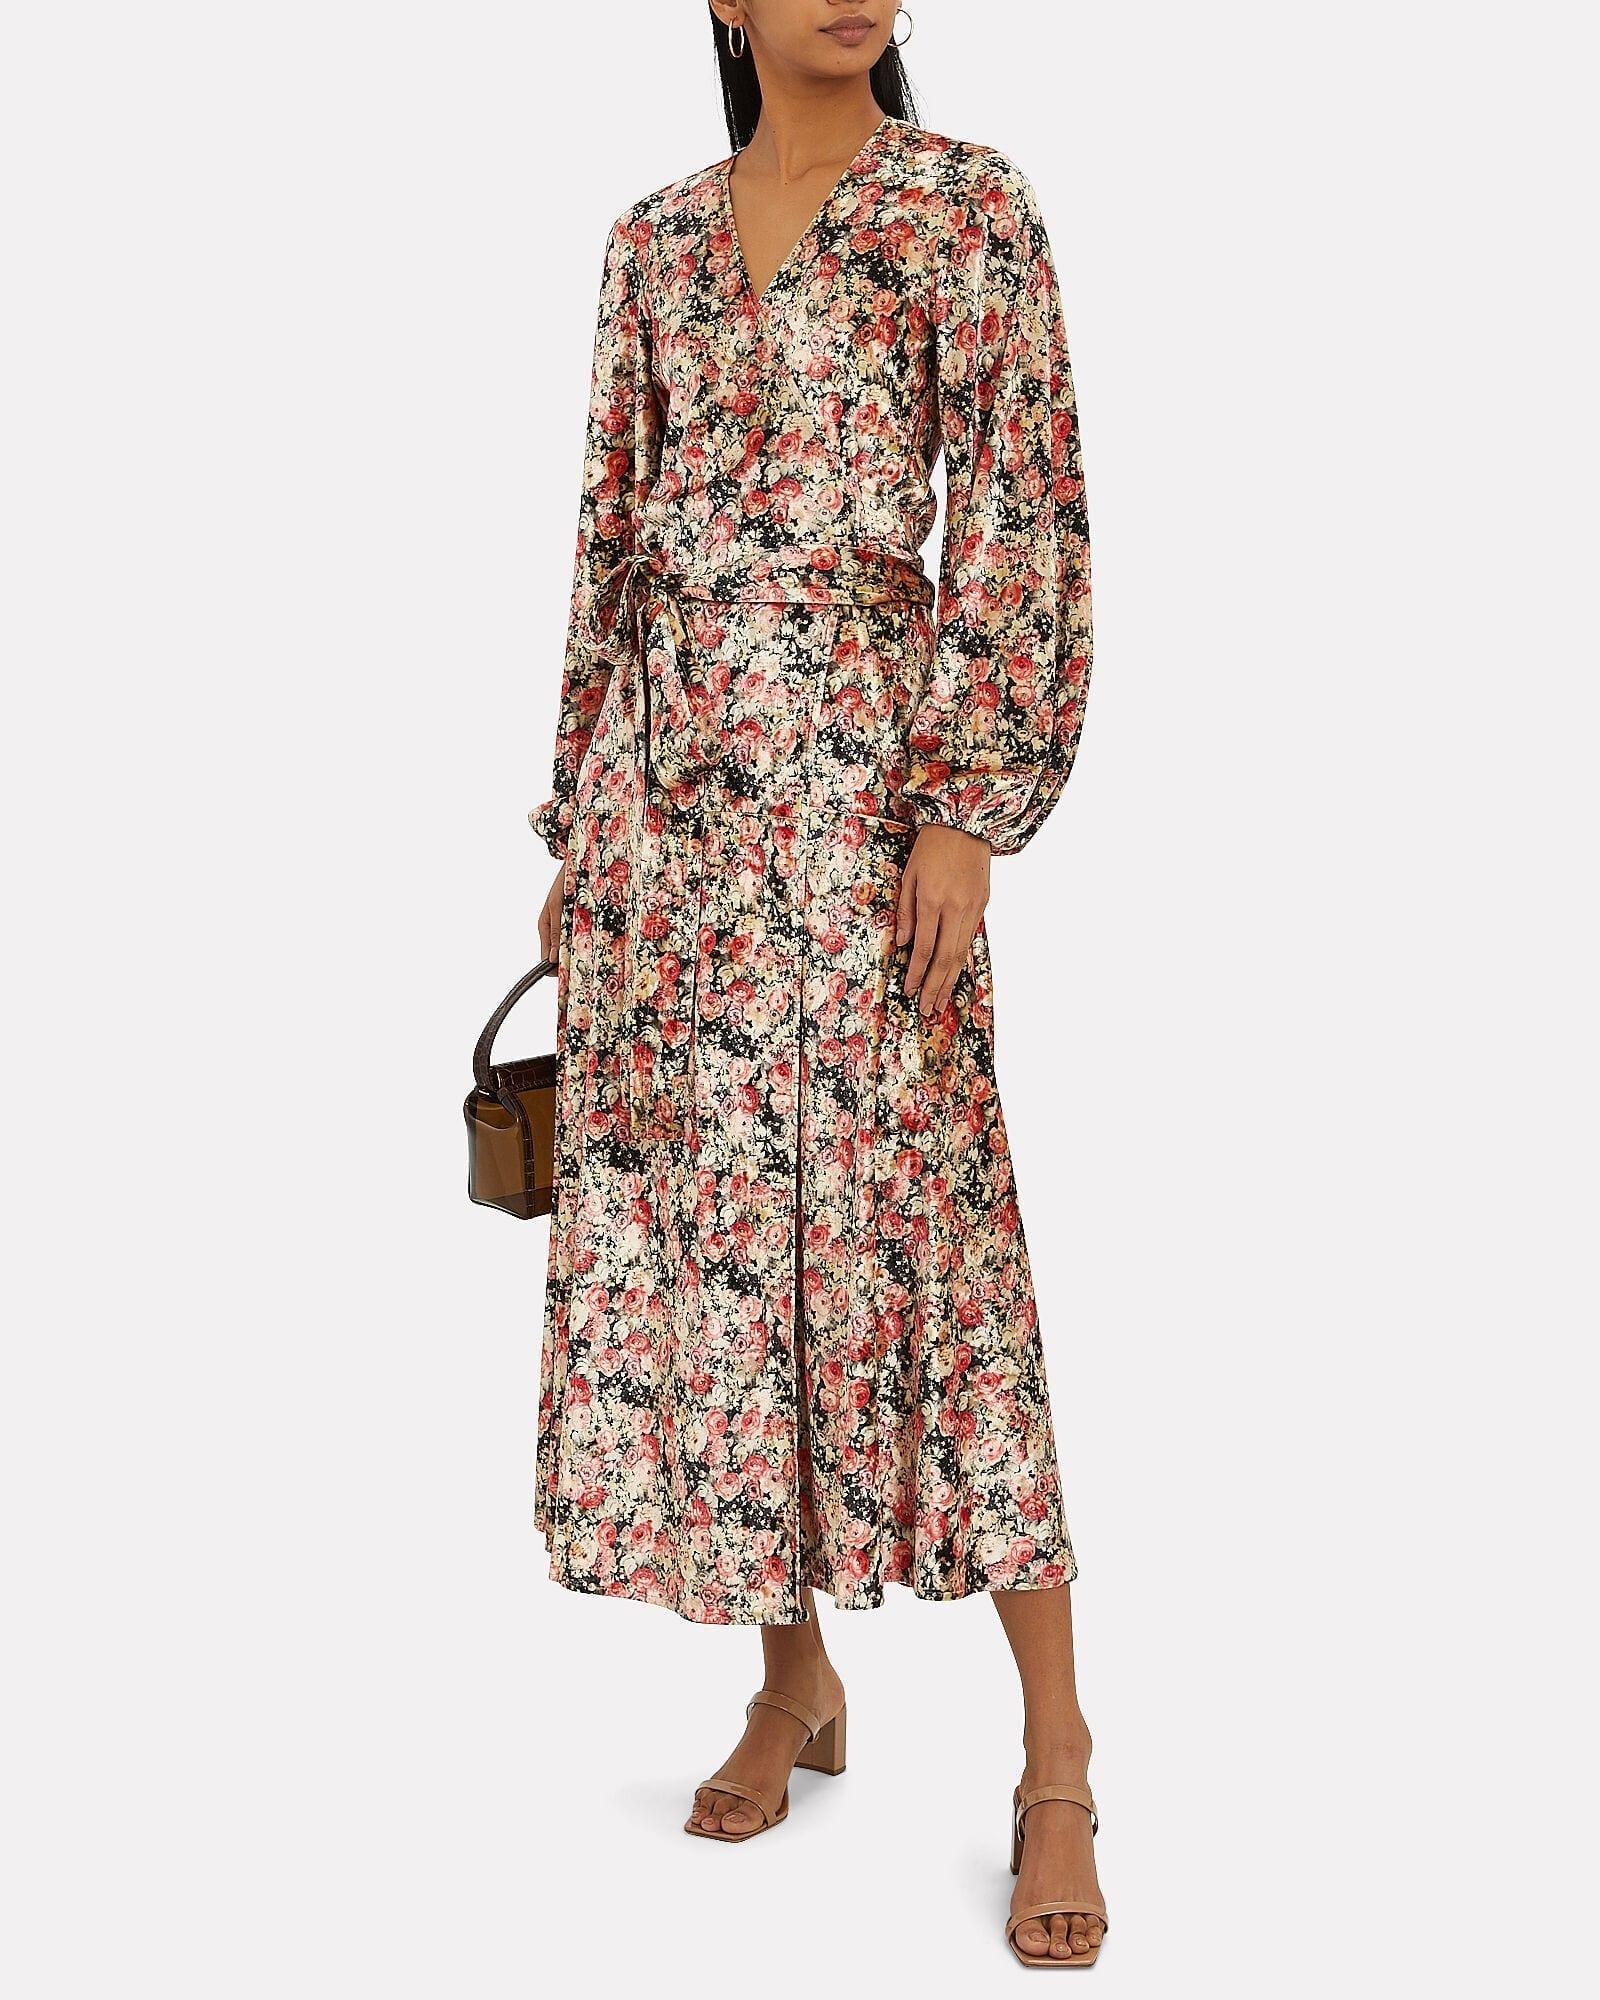 ROTATE BIRGER CHRISTENSEN Beatrix Velvet Floral Wrap Dress